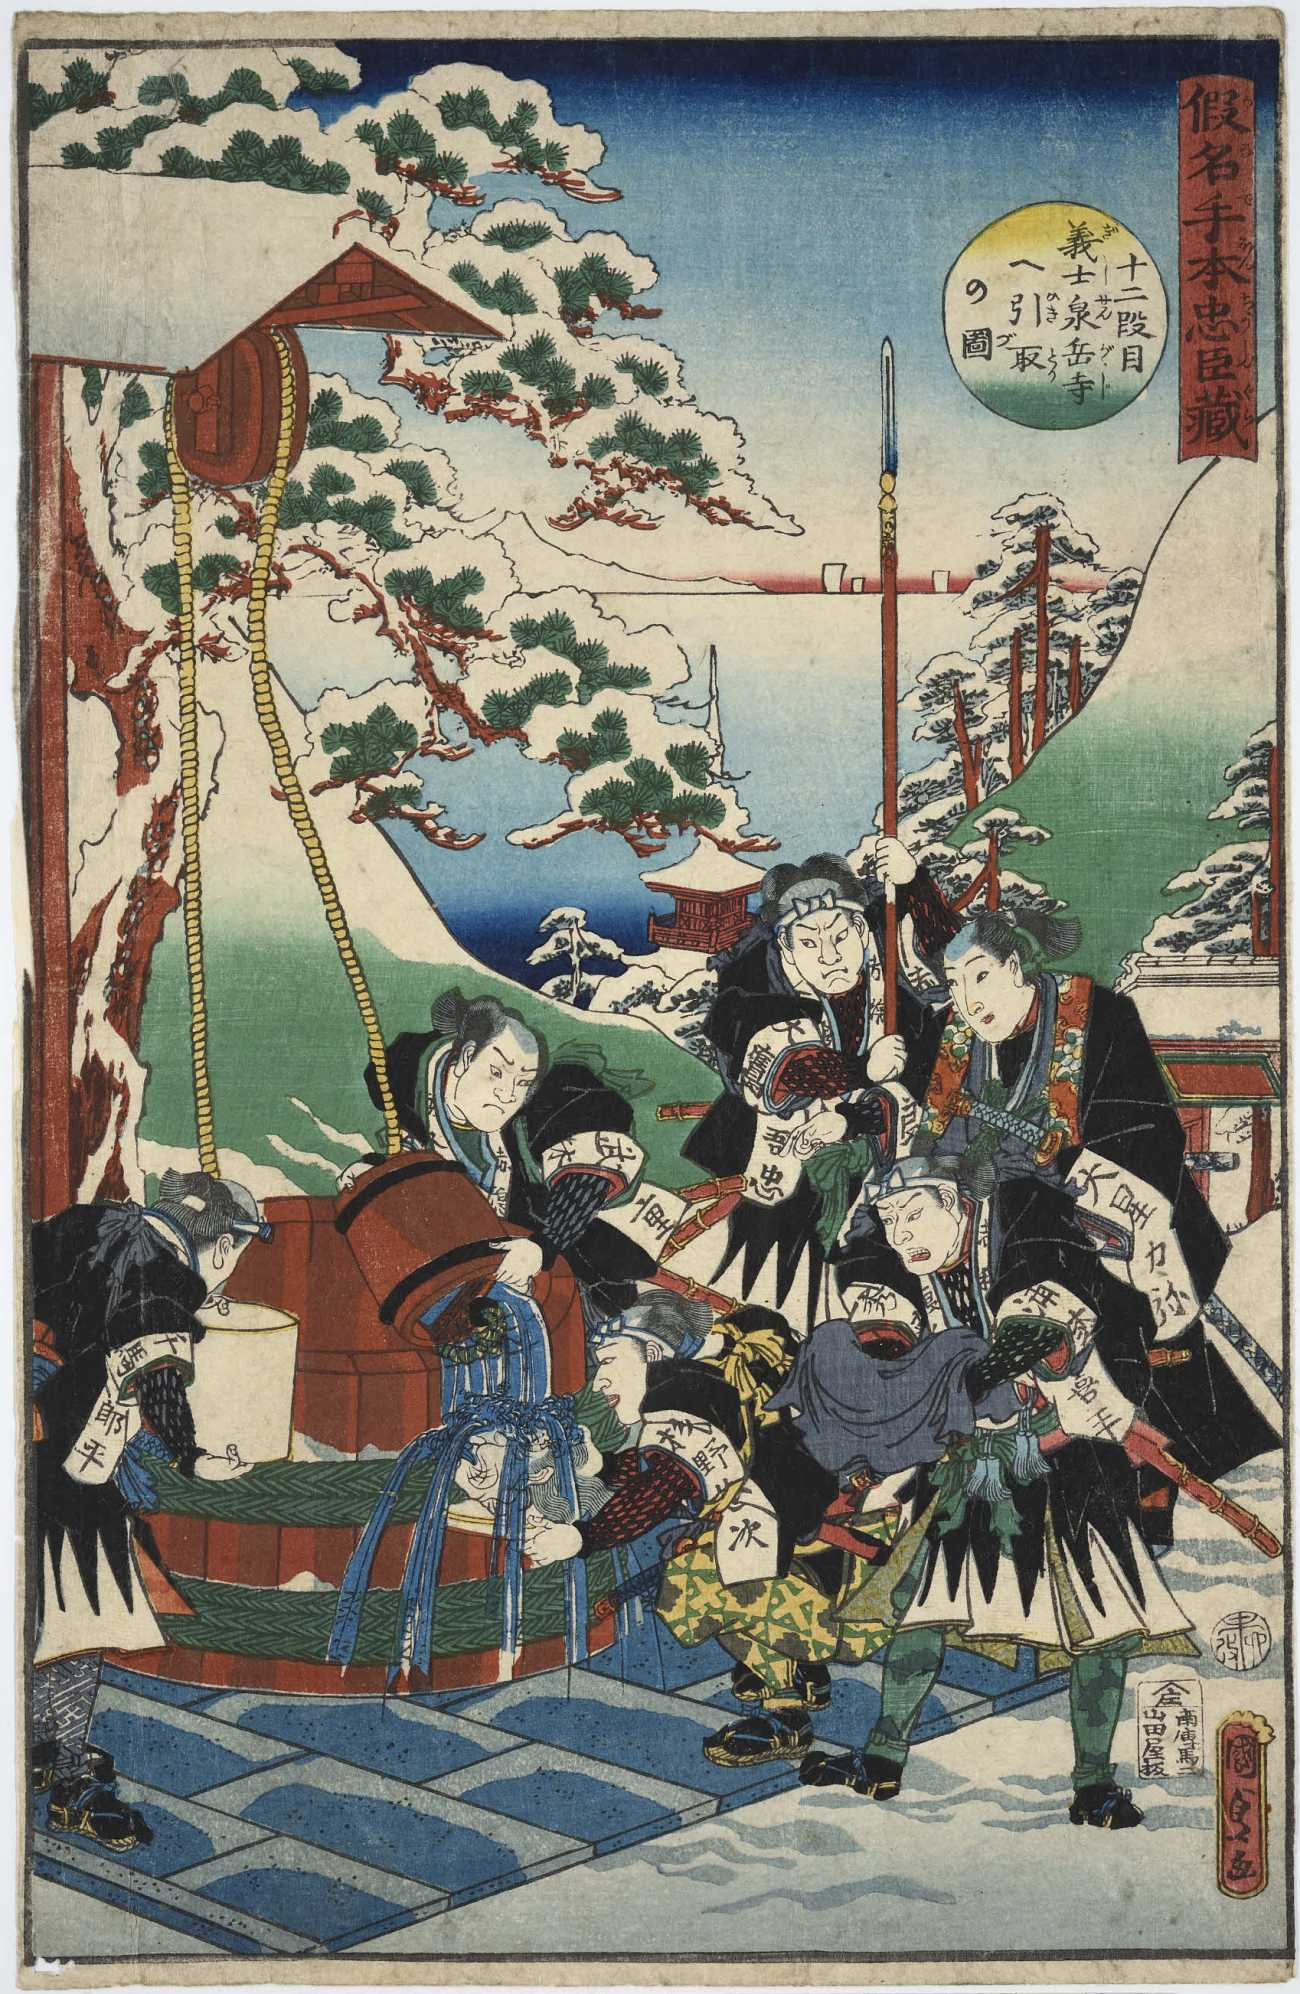 A6-22 十二段目 義士泉岳寺へ引取の図